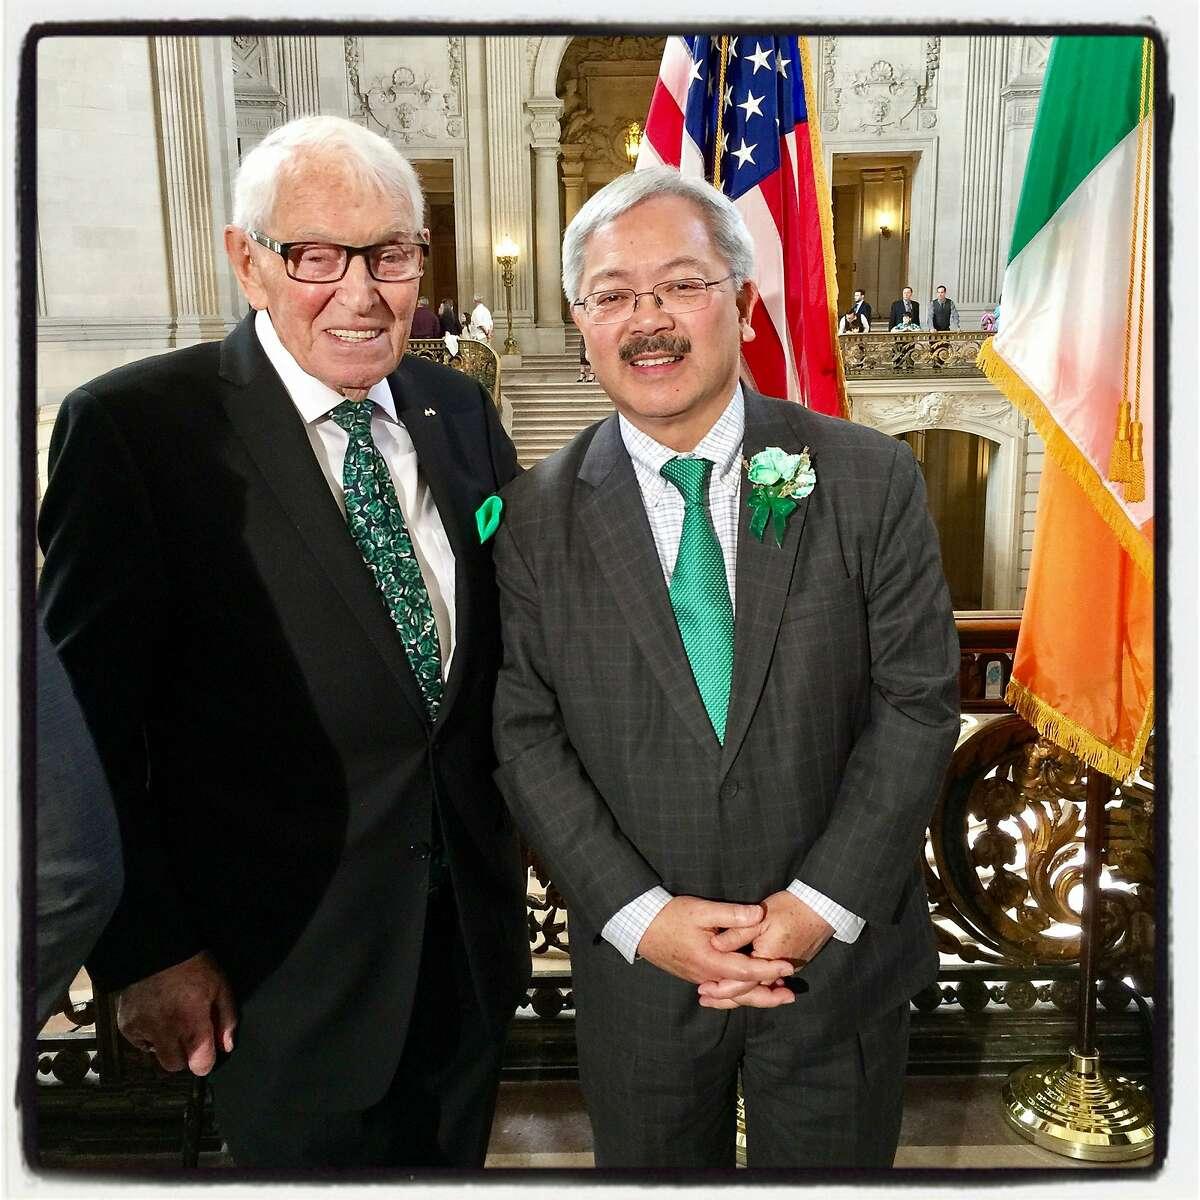 SF-Cork Sister City committee cofounder John Moylan (left) and Mayor Ed Lee at City Hall for the Irish Flag raising. March 3, 2017.